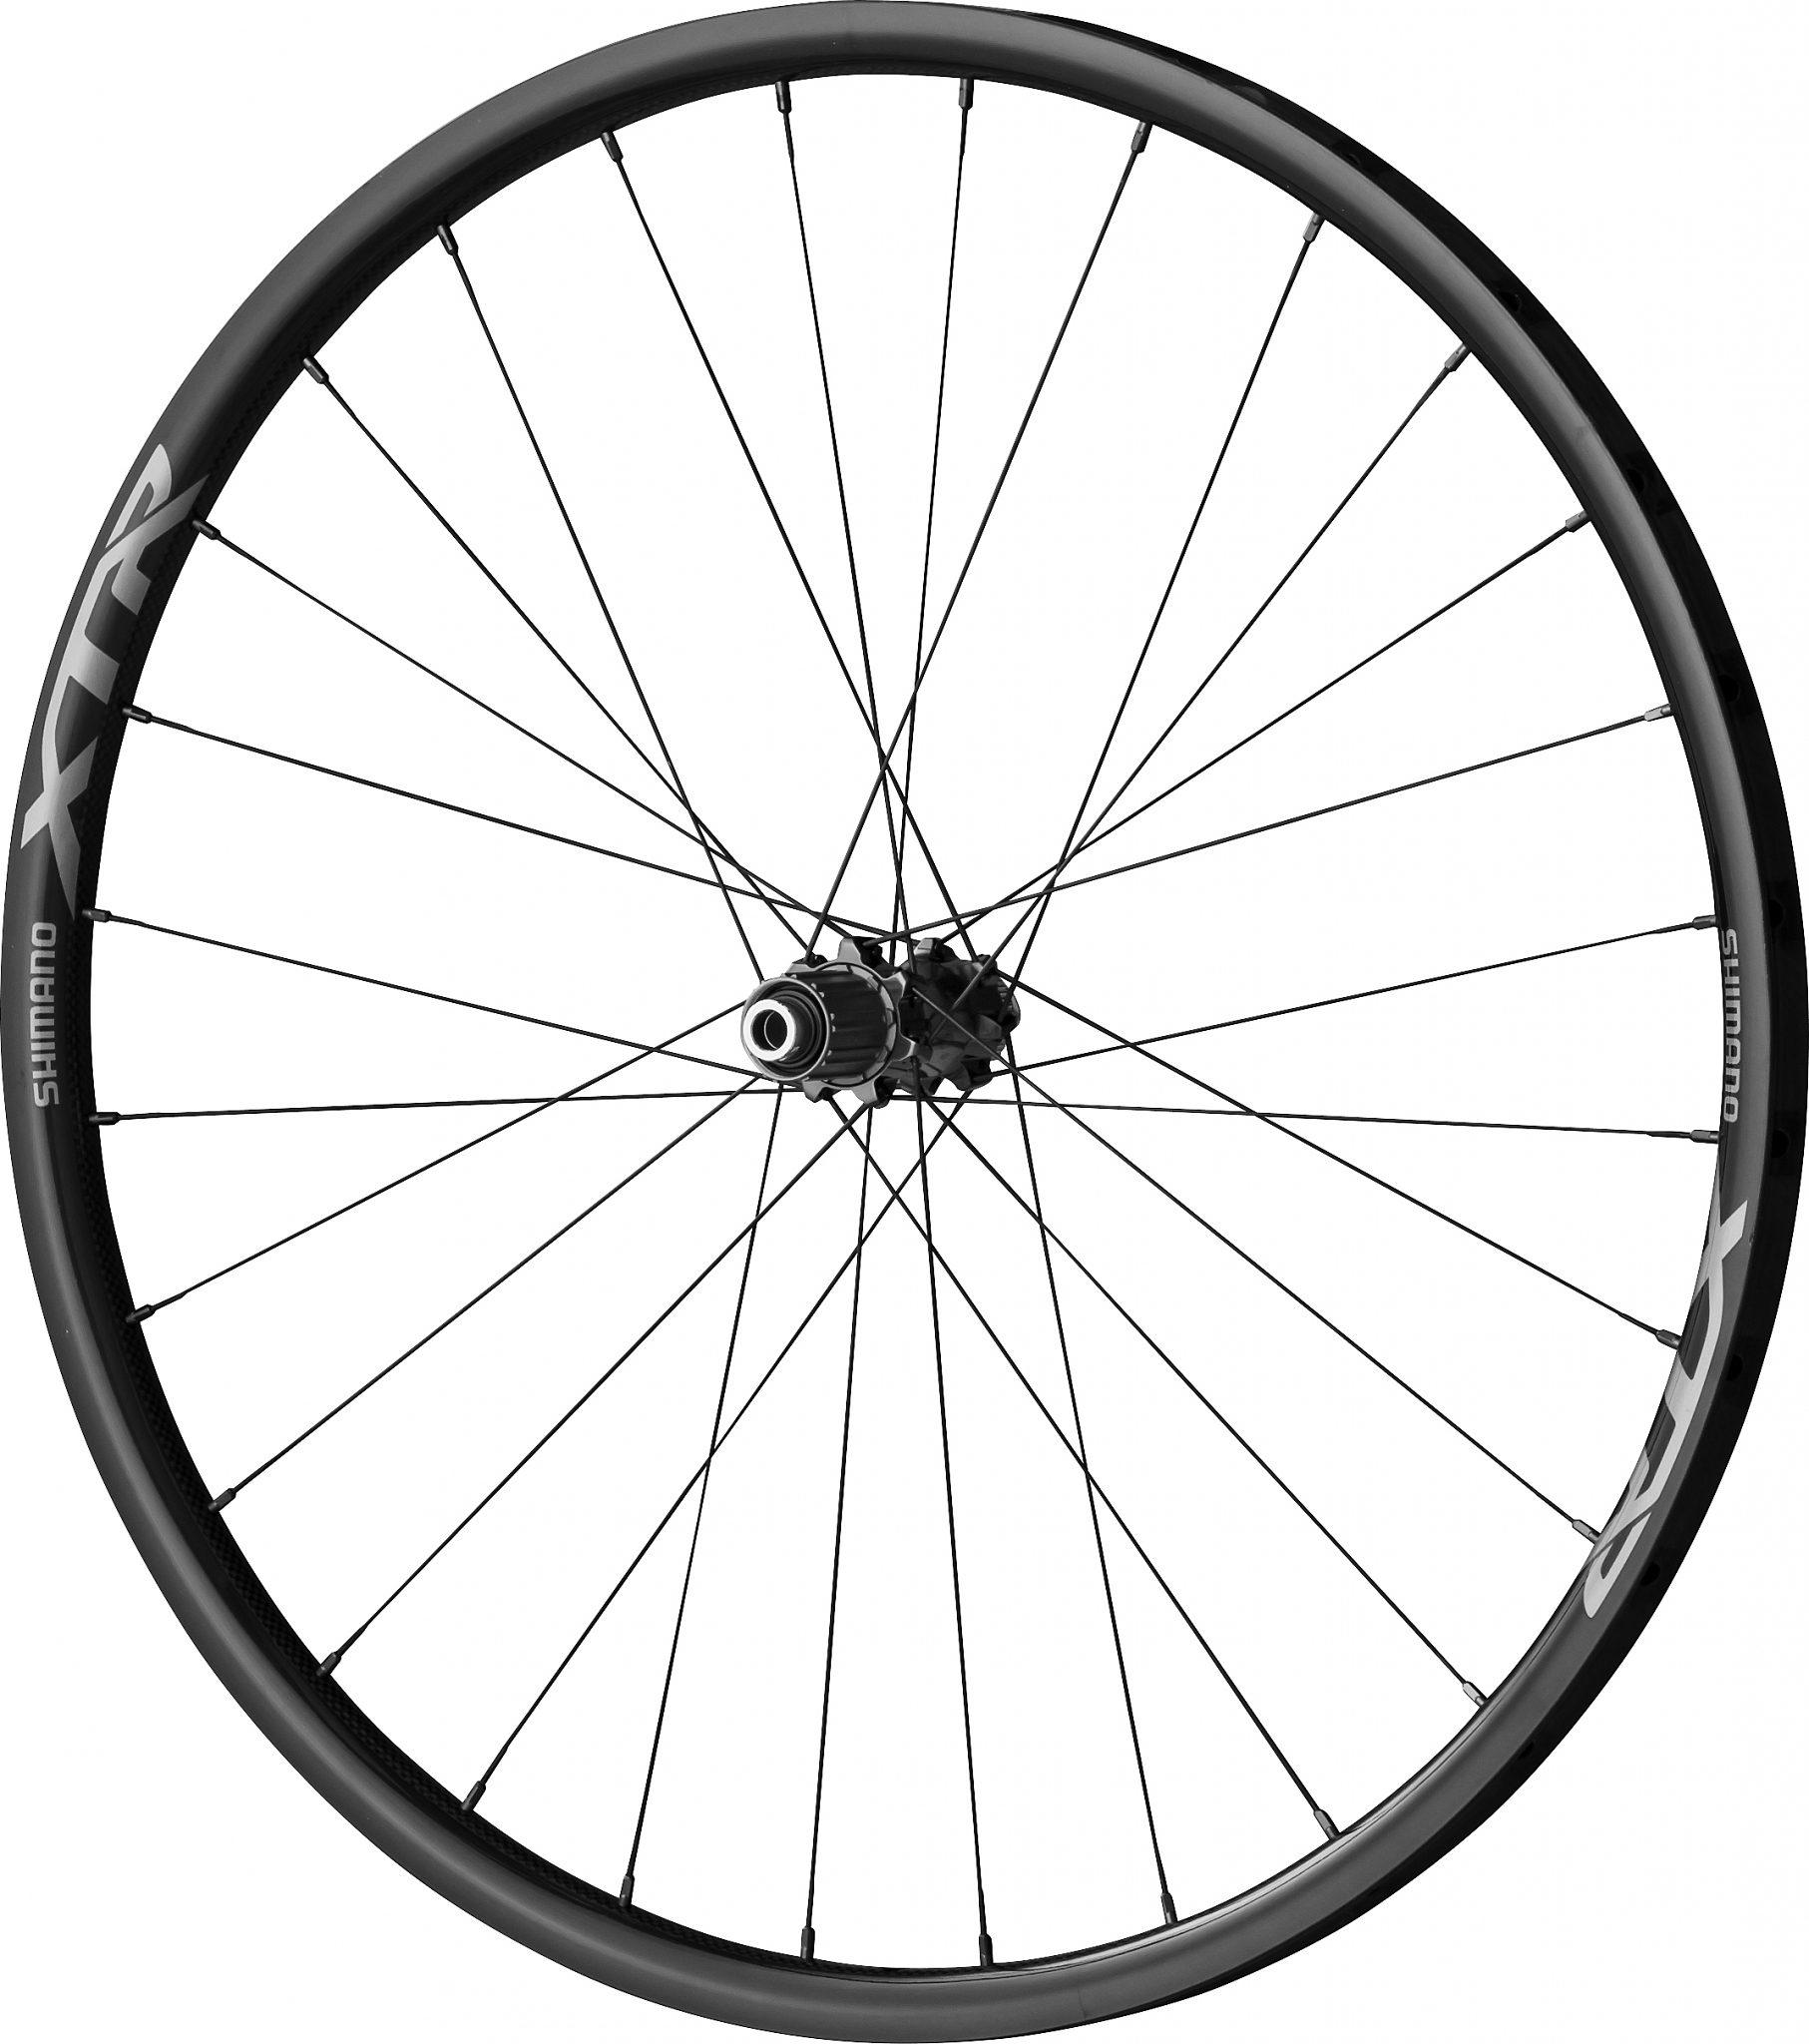 "Shimano Laufrad »XTR WH-M9000 Laufradsatz Carbon 29"" CL«"